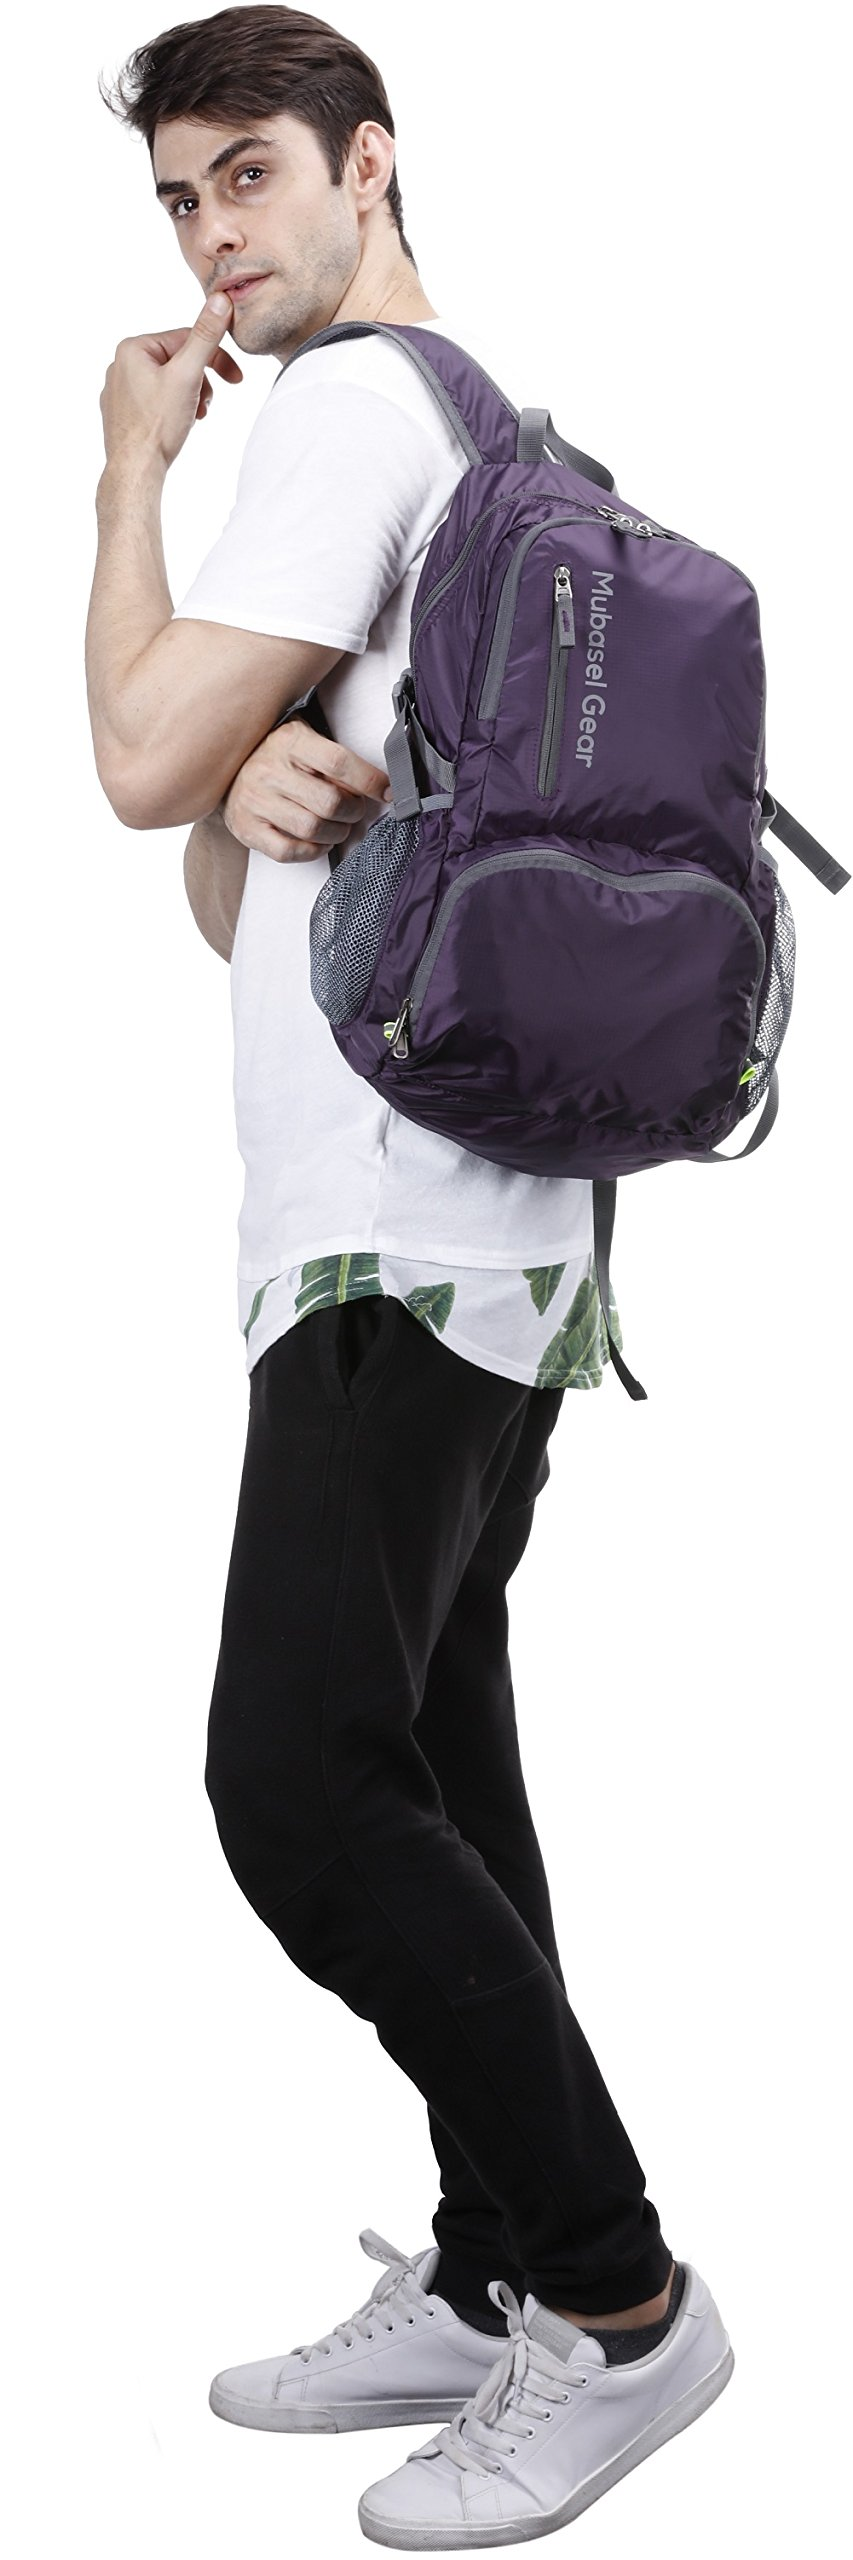 Mubasel Gear Backpack - Lightweight Backpacks for Travel Hiking - Daypack for Women Men (Purple) by Mubasel Gear (Image #5)